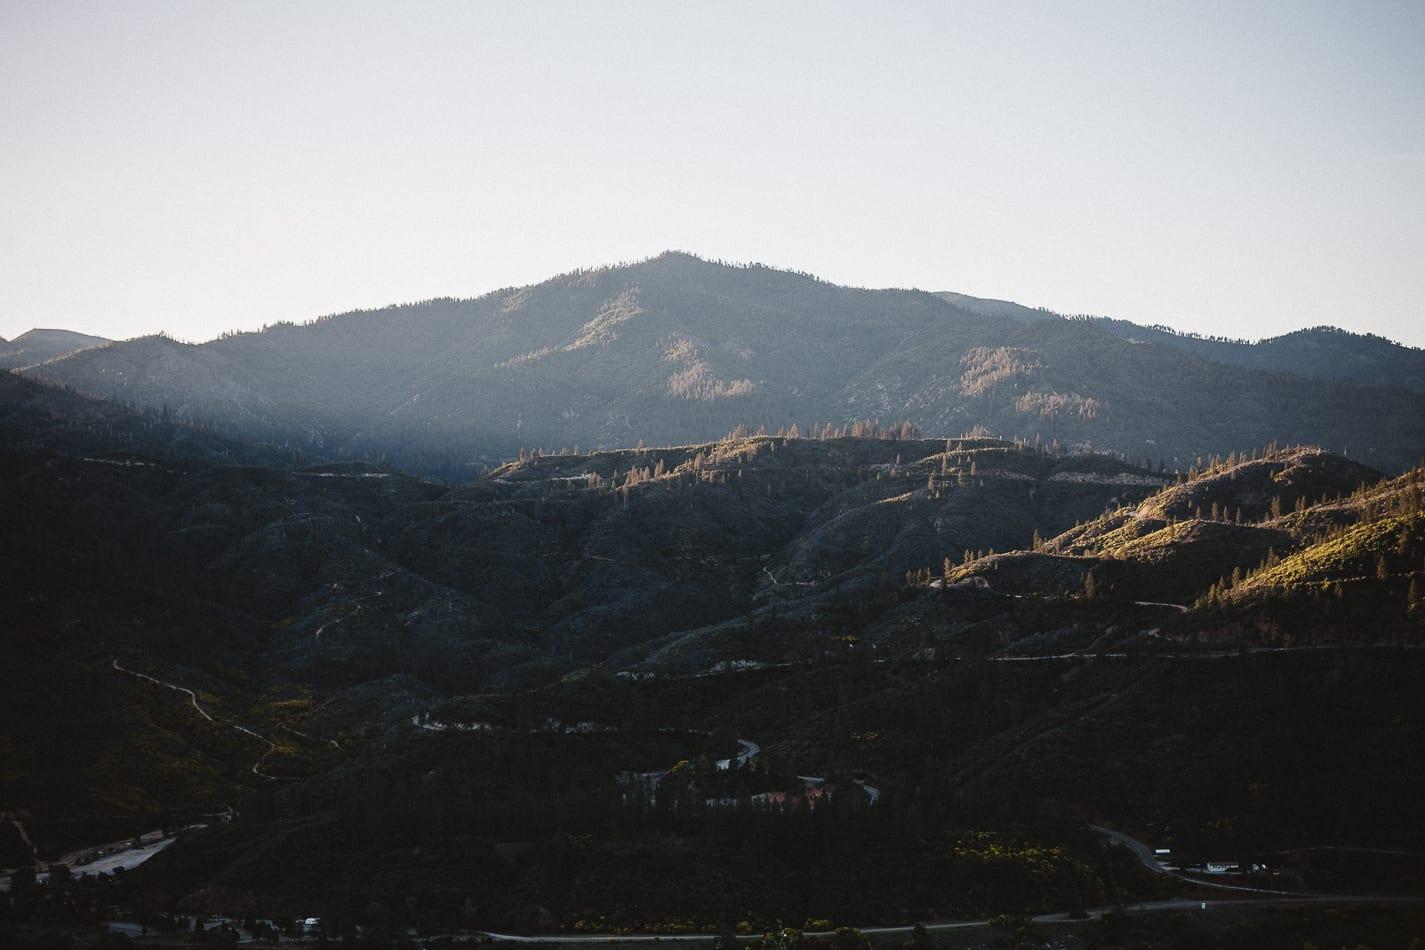 shasta-dam-california-lifestyle-portrait-photographer-2